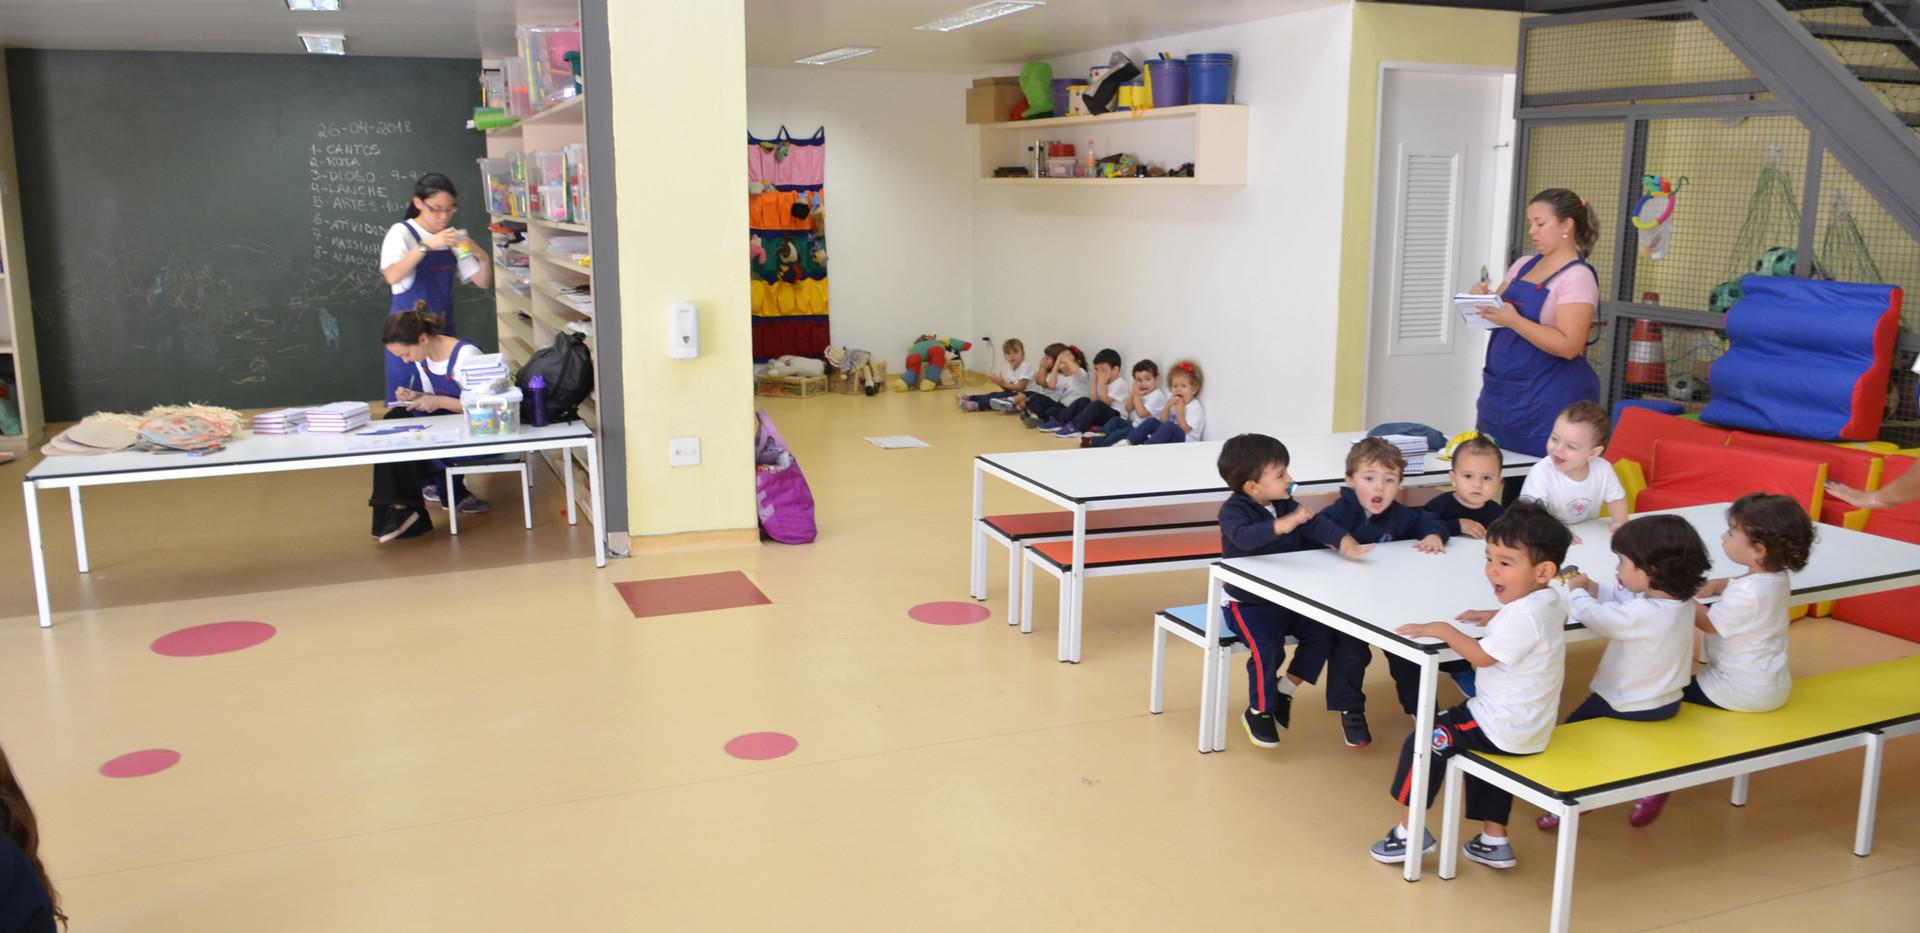 escola-infantil-moema-14.JPG